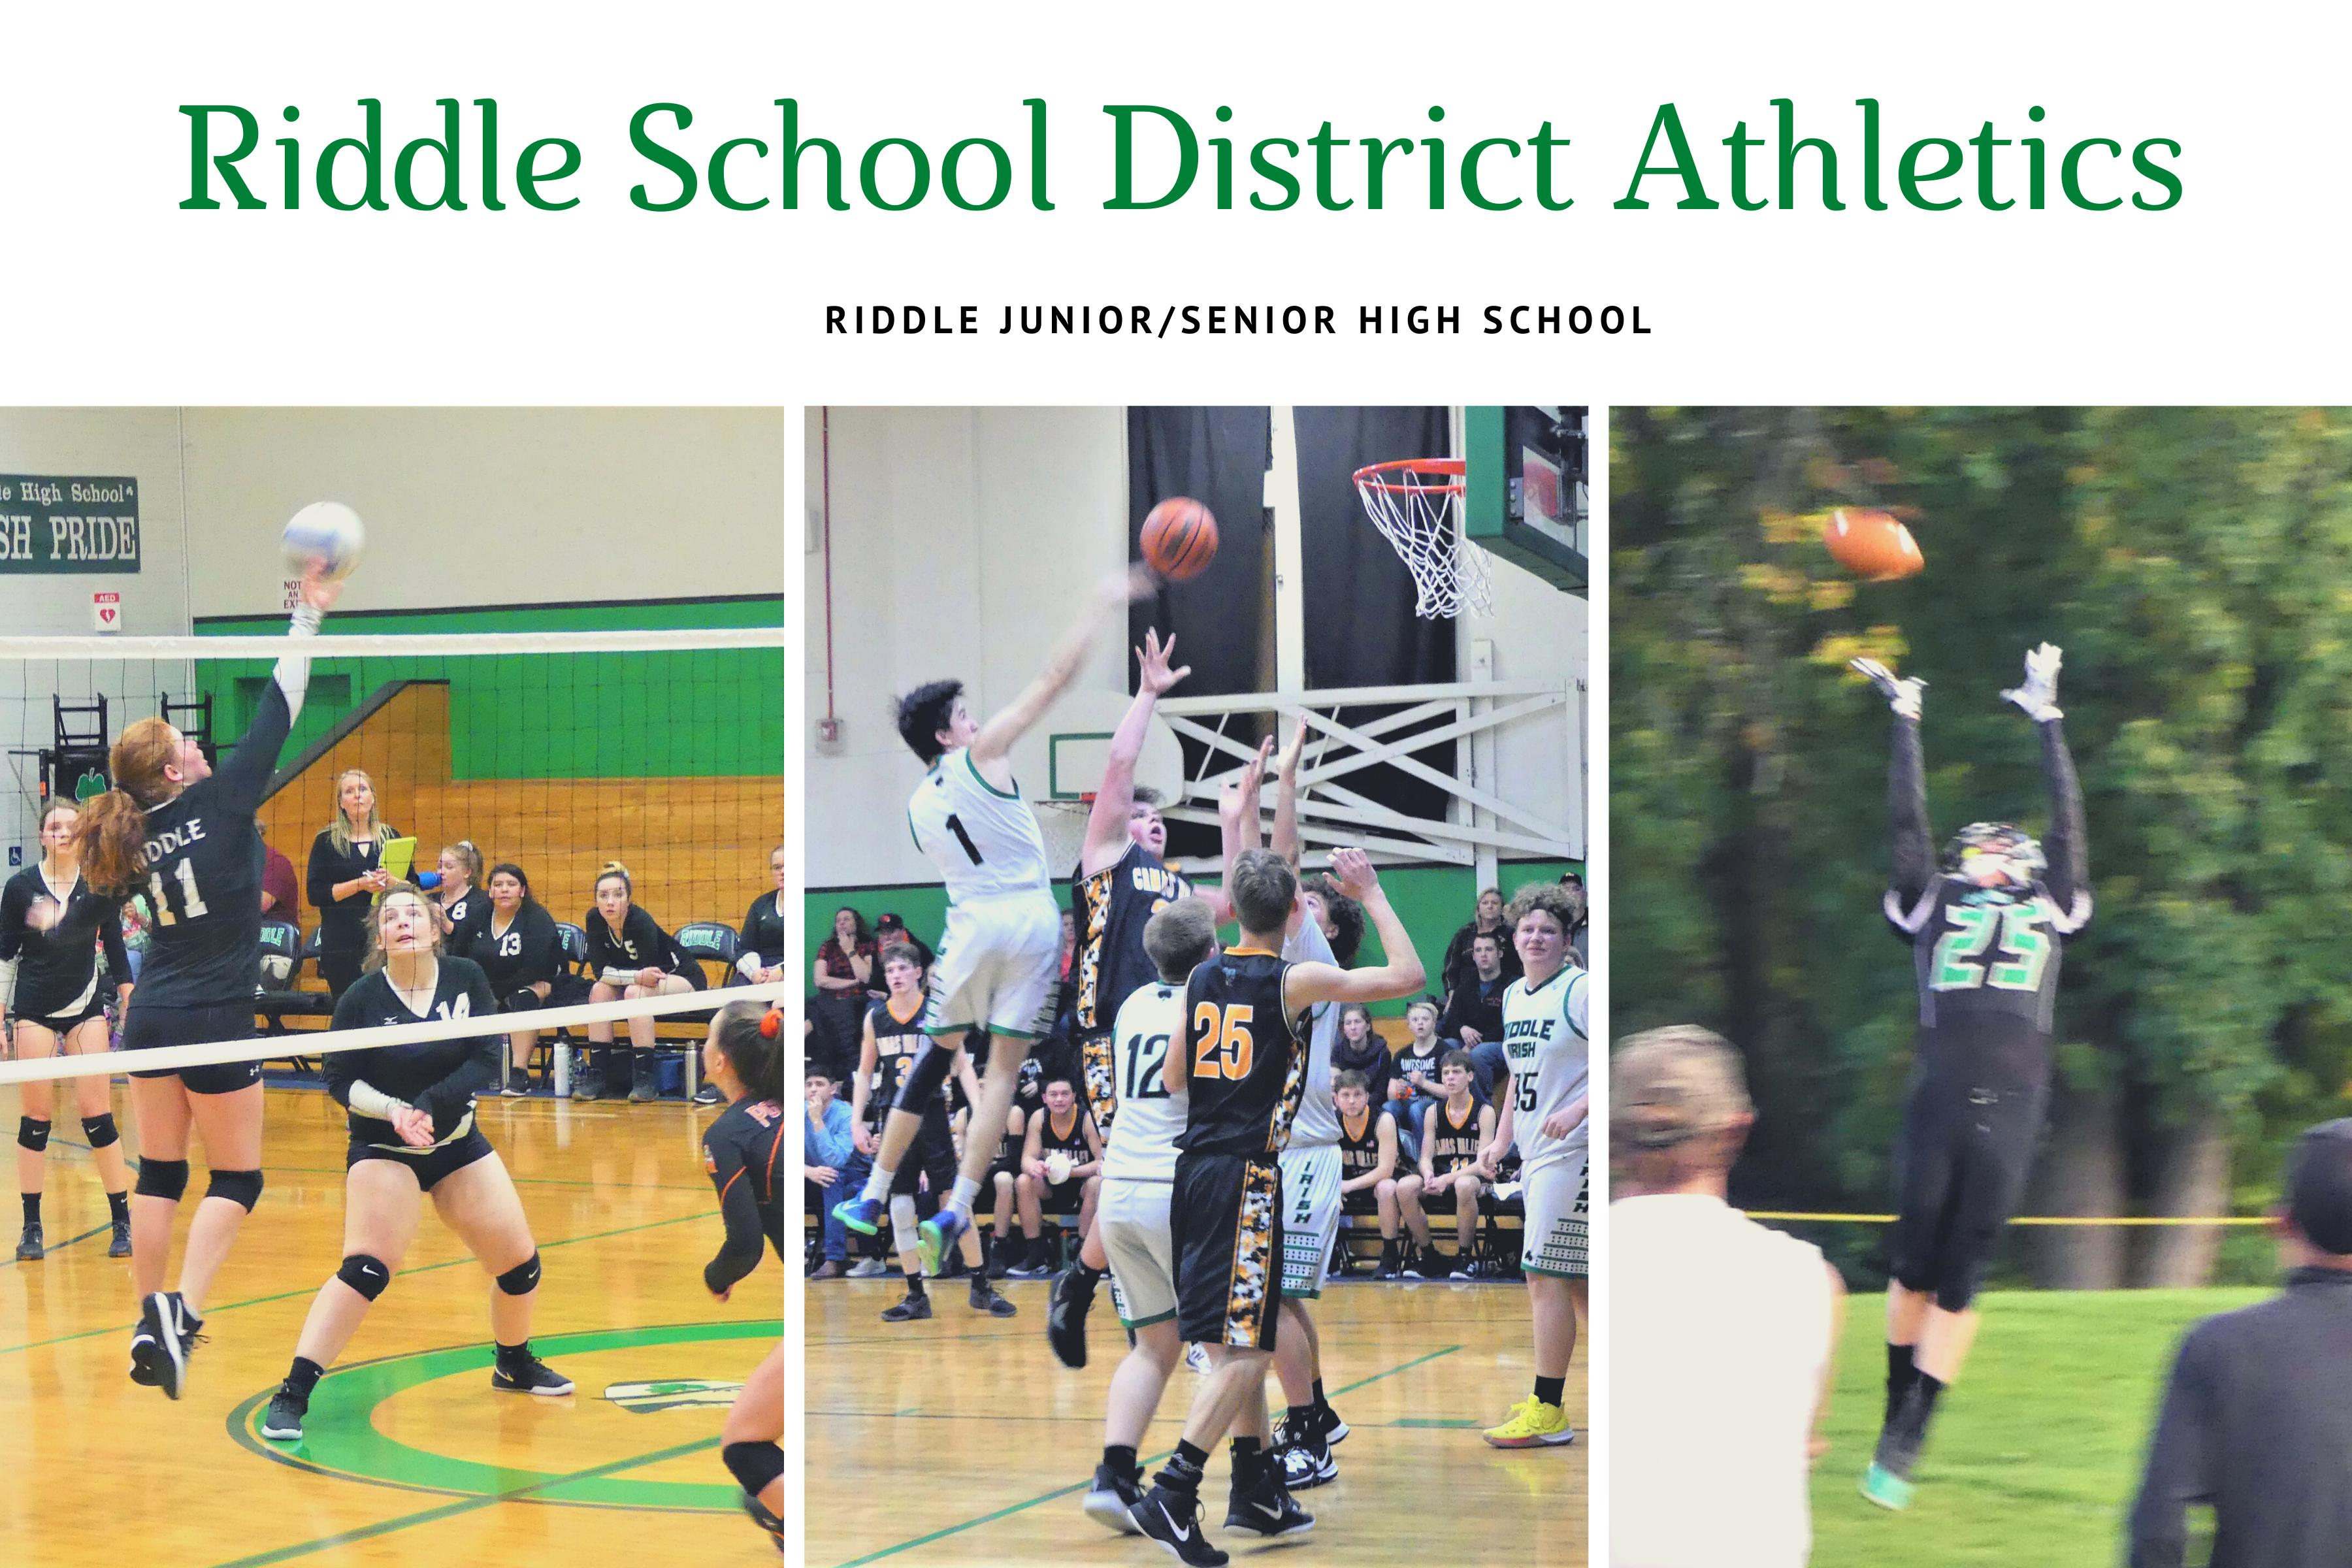 Riddle School District Athletics